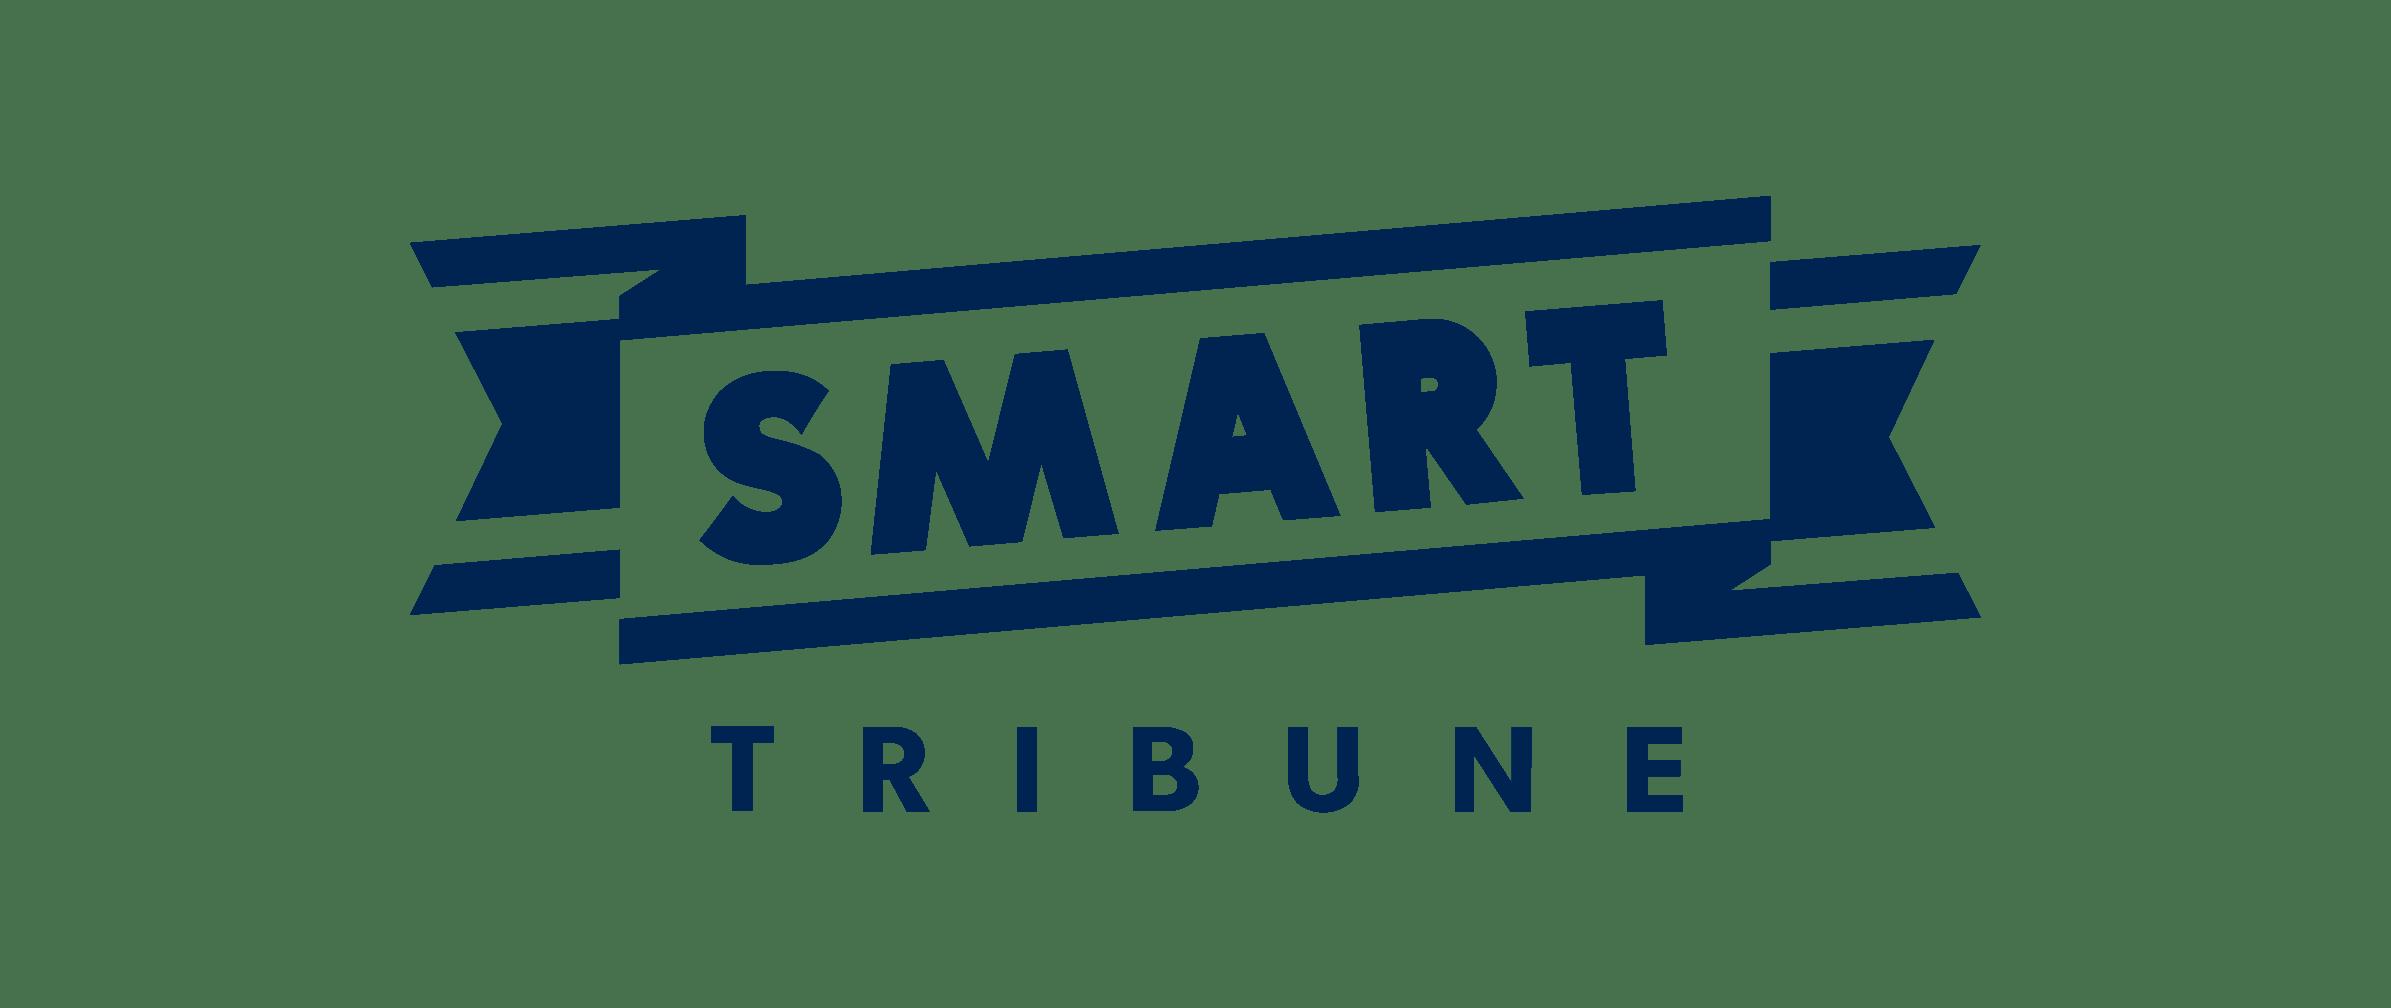 Review Smart Tribune: Leading Self-Service and Customer Autonomy Solution - Appvizer